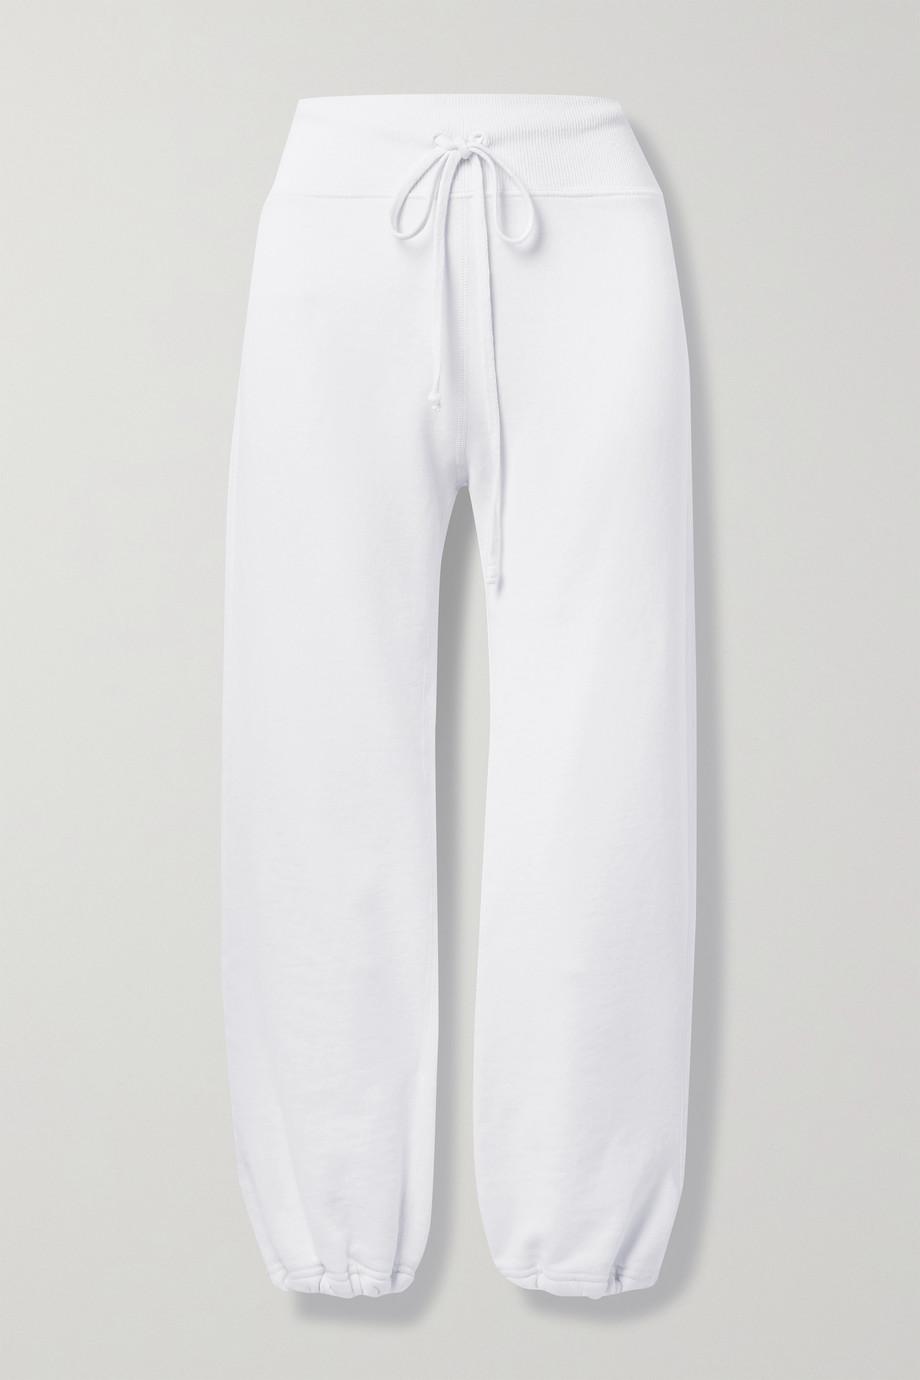 Nili Lotan Pantalon de survêtement en jersey de coton LA